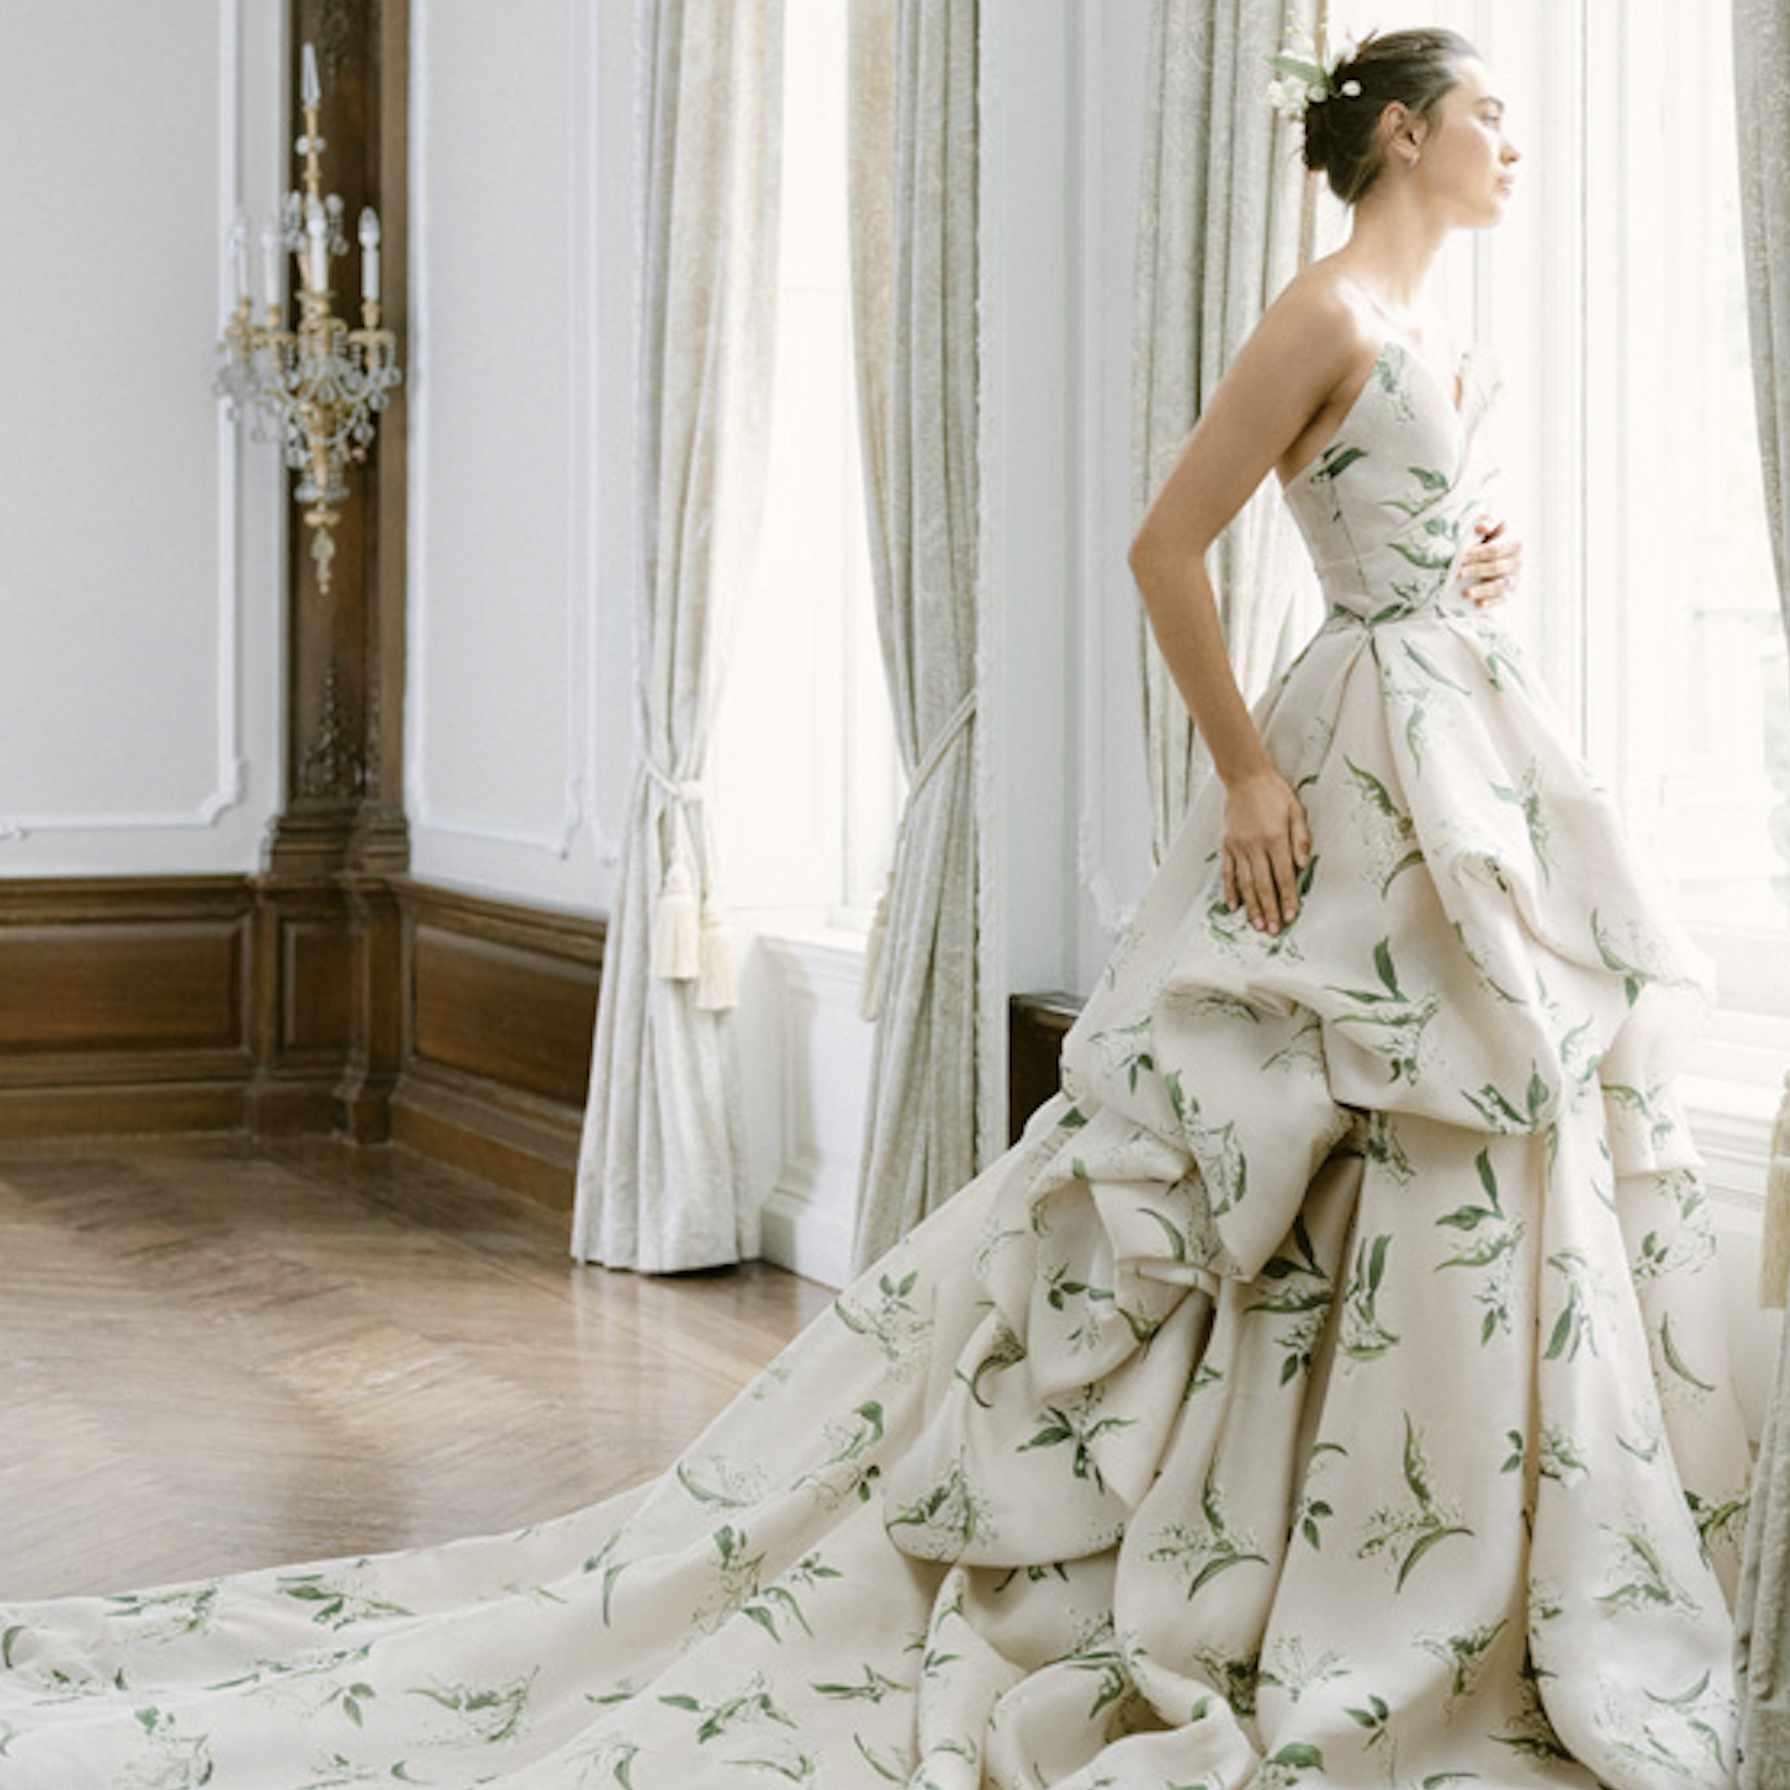 39 Best Vintage Inspired Wedding Dresses Of 2021